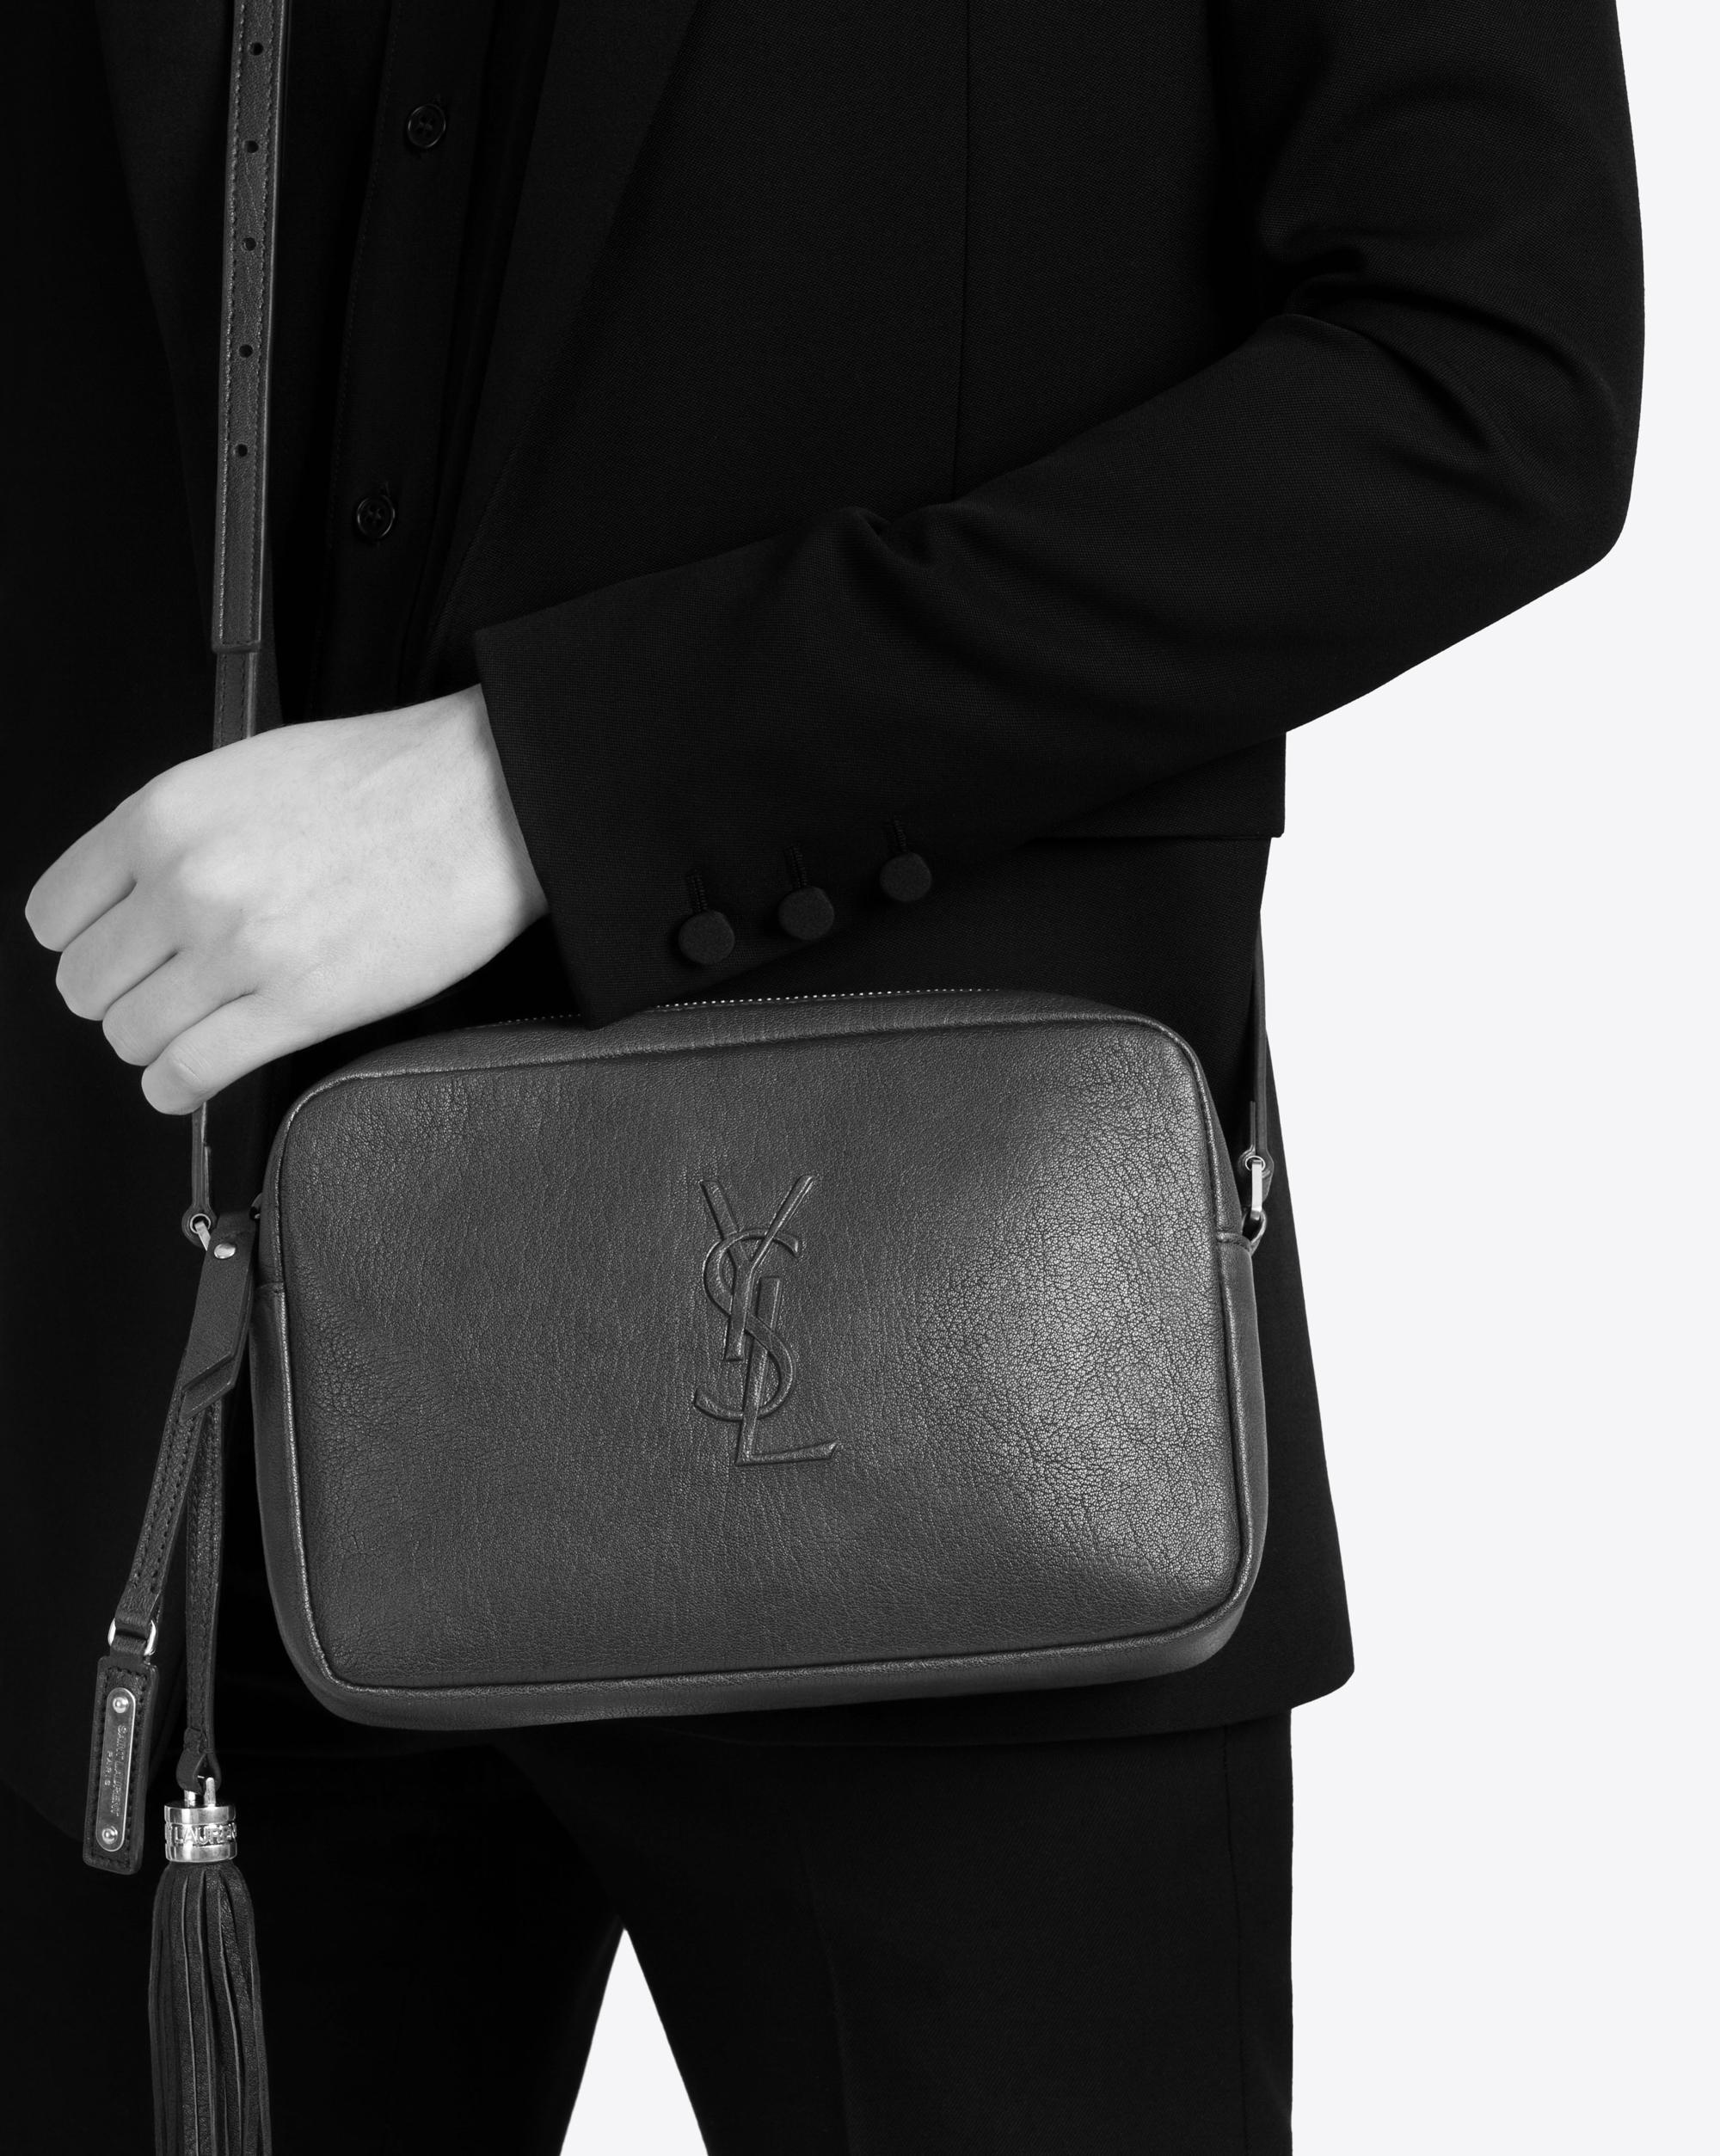 c81925d014a8 Lyst - Saint Laurent Lou Camera Bag in Black - Save 18%